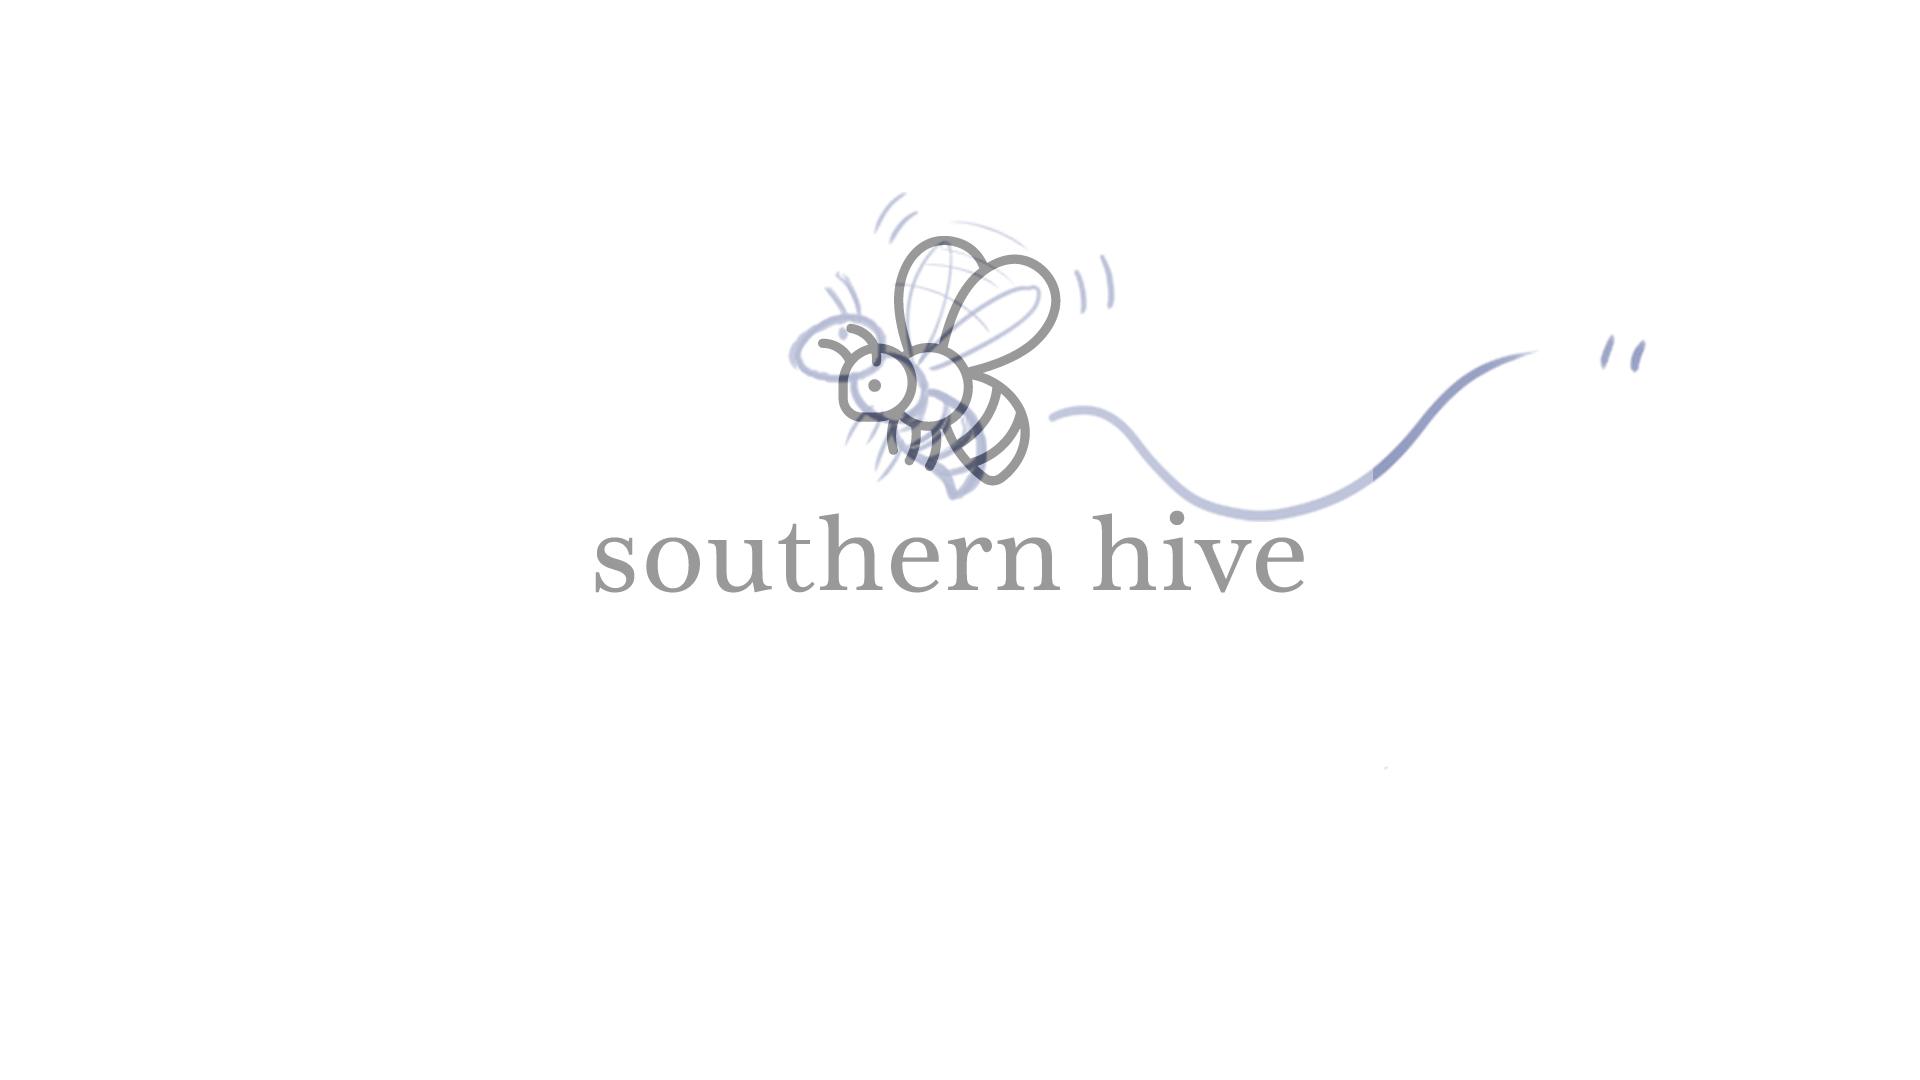 TM_SouthHive_V2_0038_Layer Comp 39.jpg